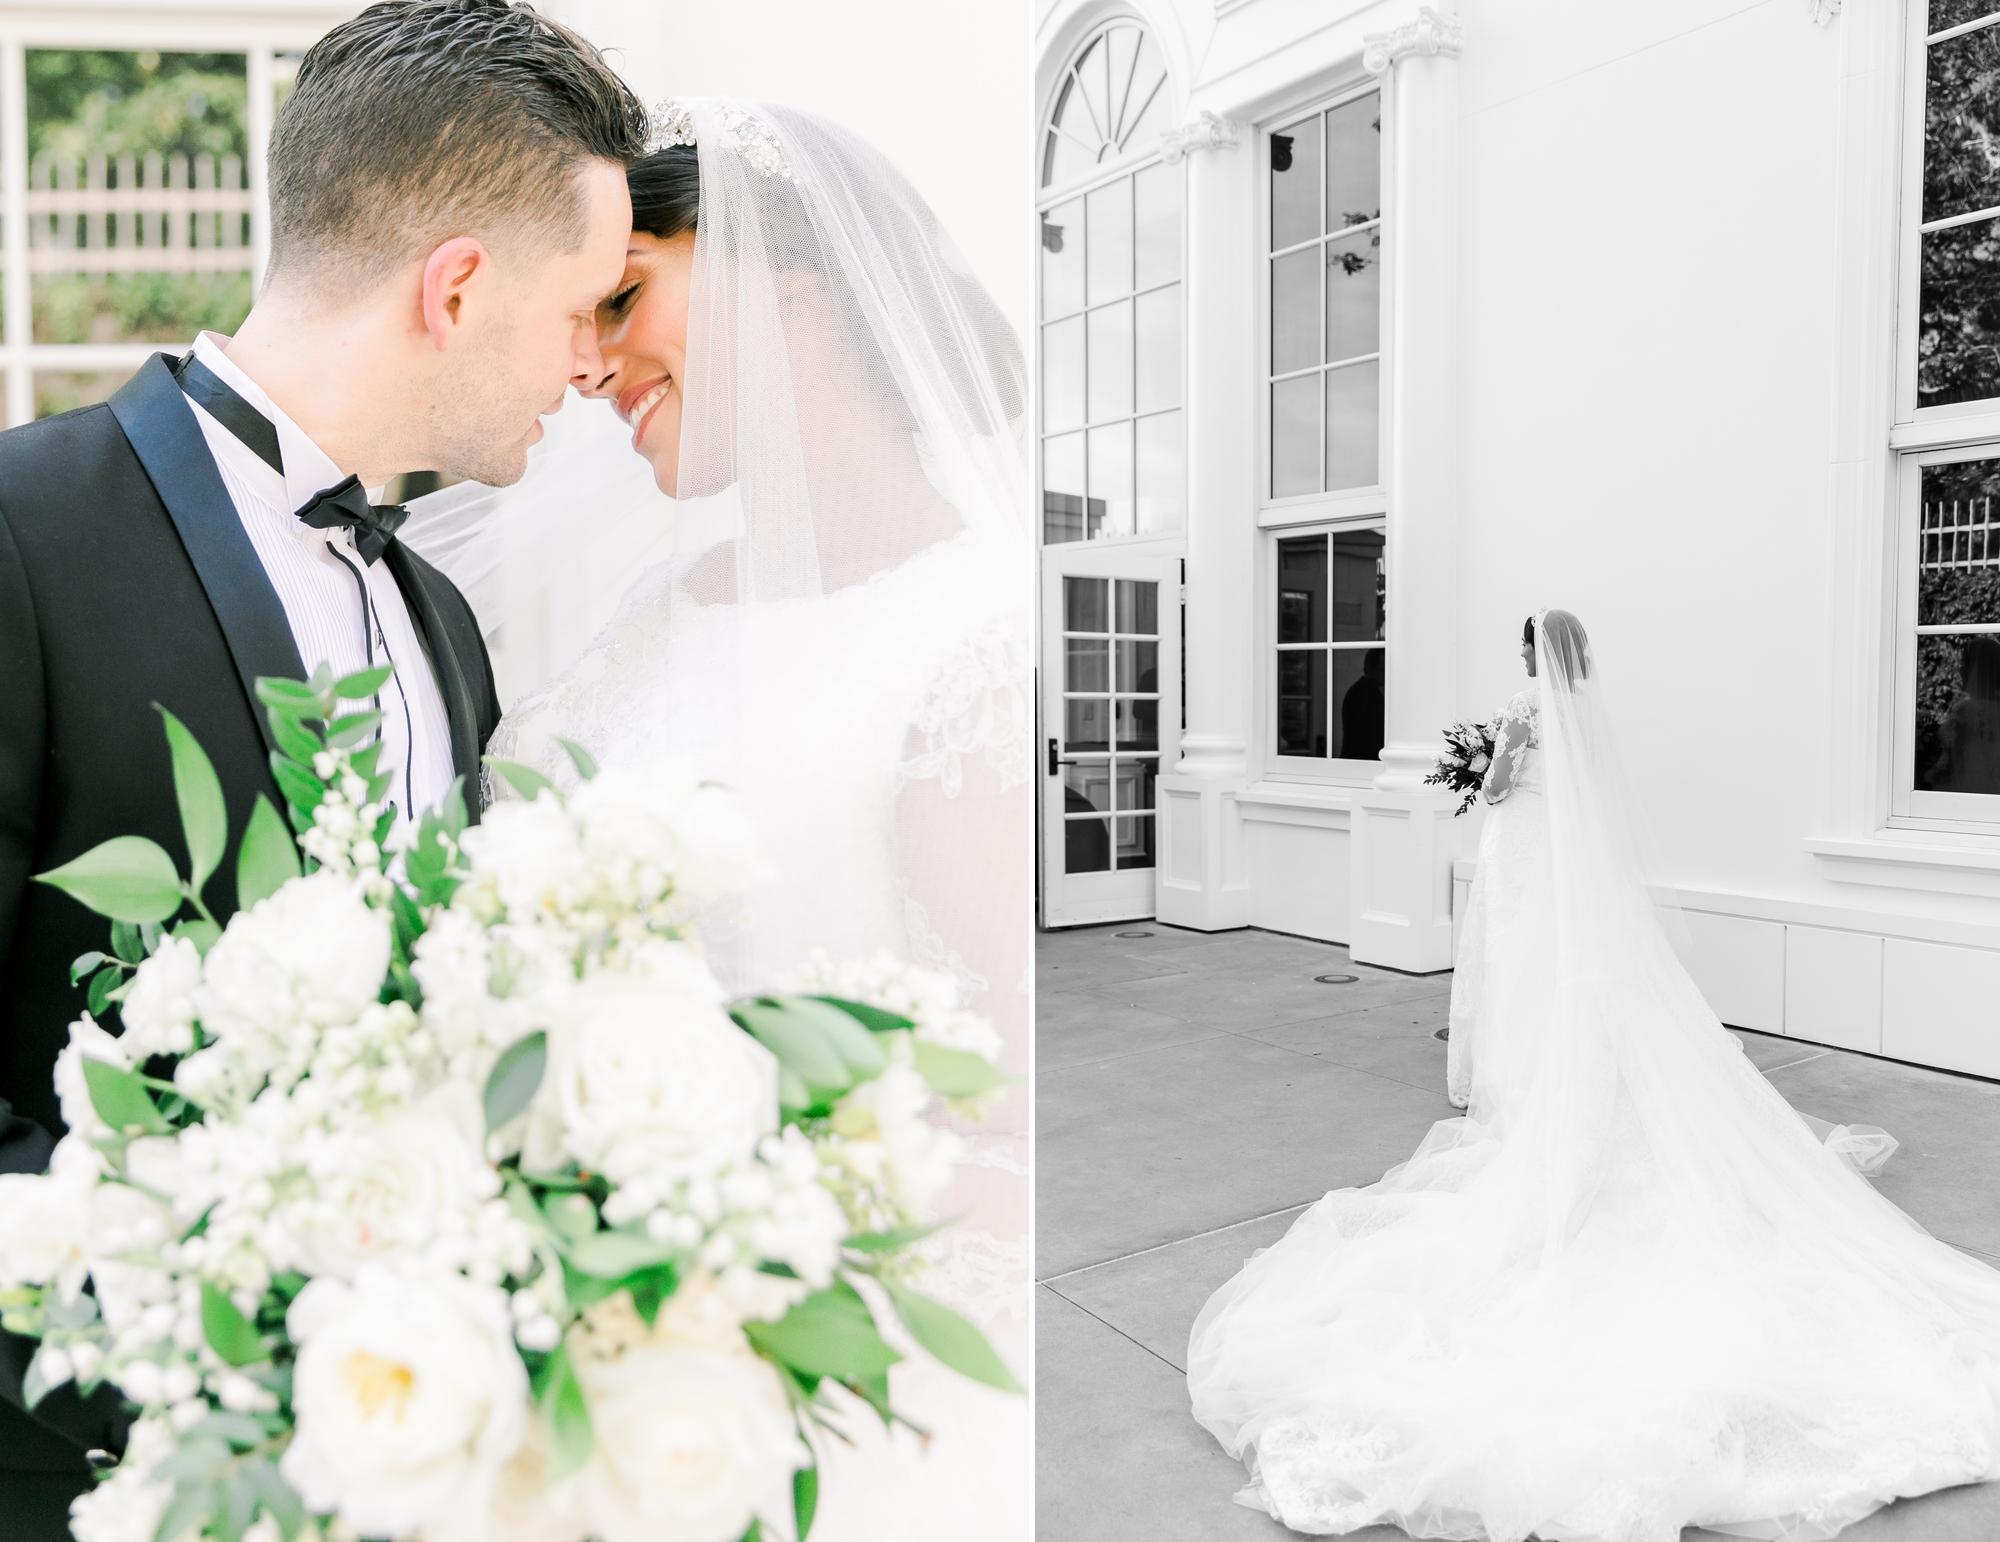 ROYAL-WEDDING-RICHARD-NIXON-LIBRARY 16.jpg